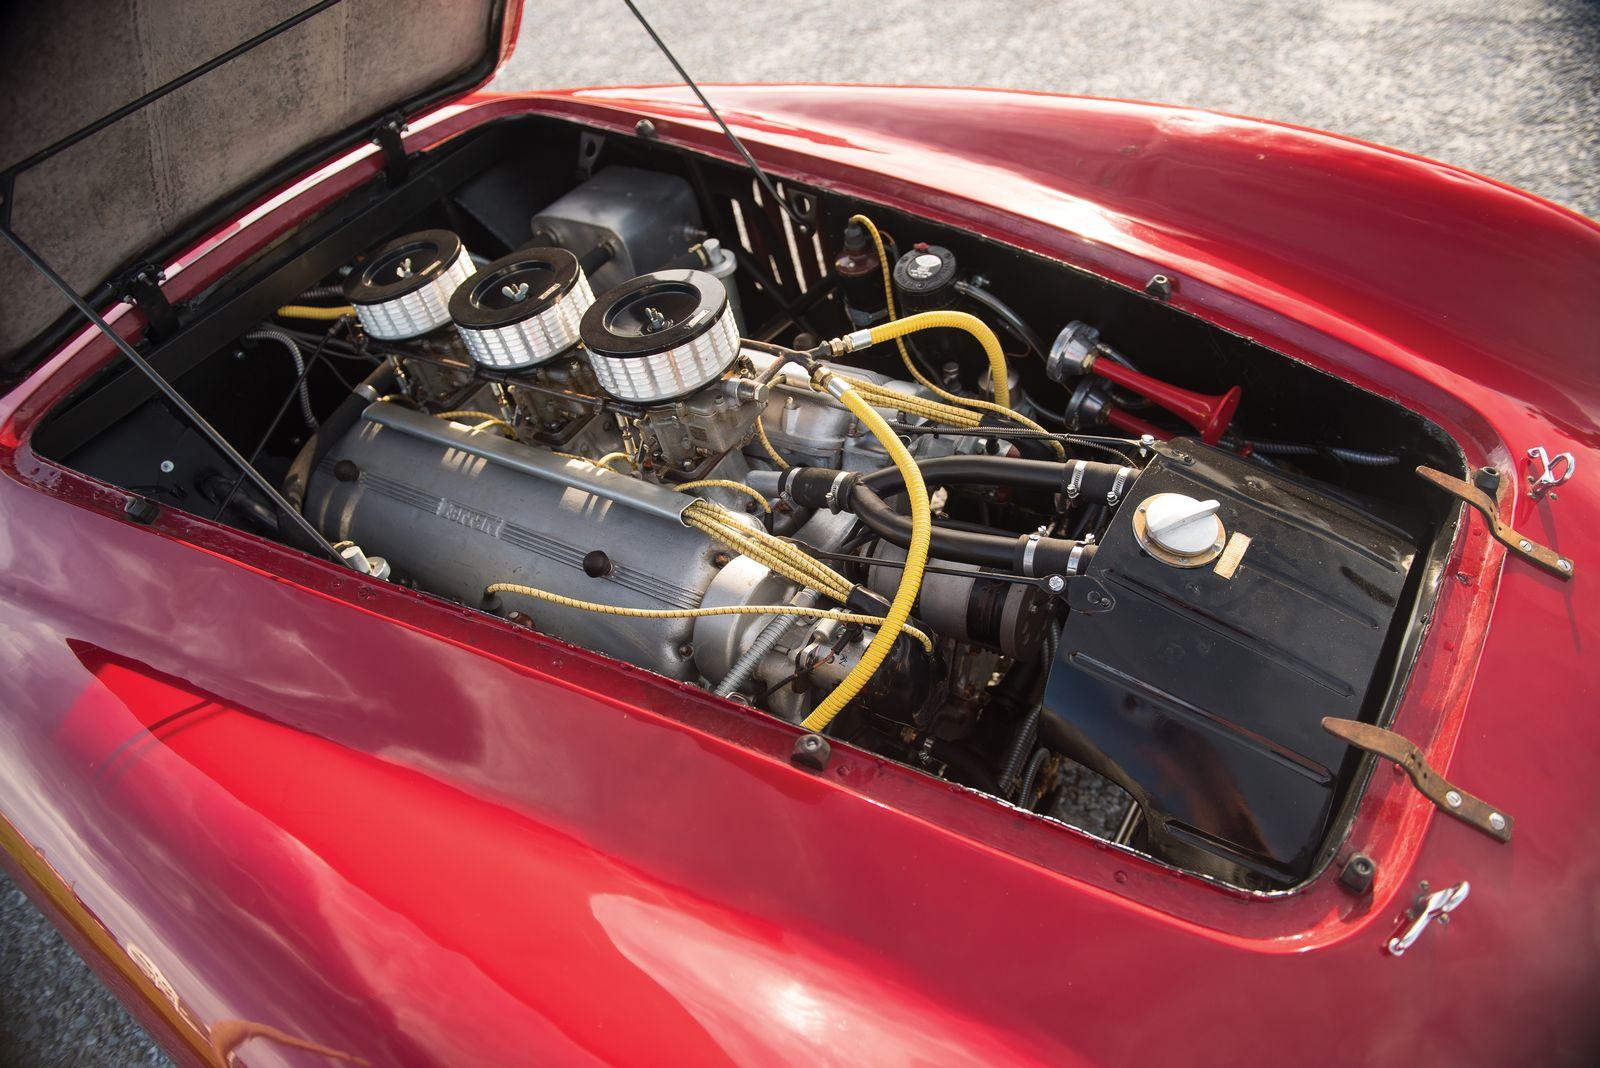 1950 Ferrari 275S 340 America Barchetta Goes To AUCTION For $10 Million 9